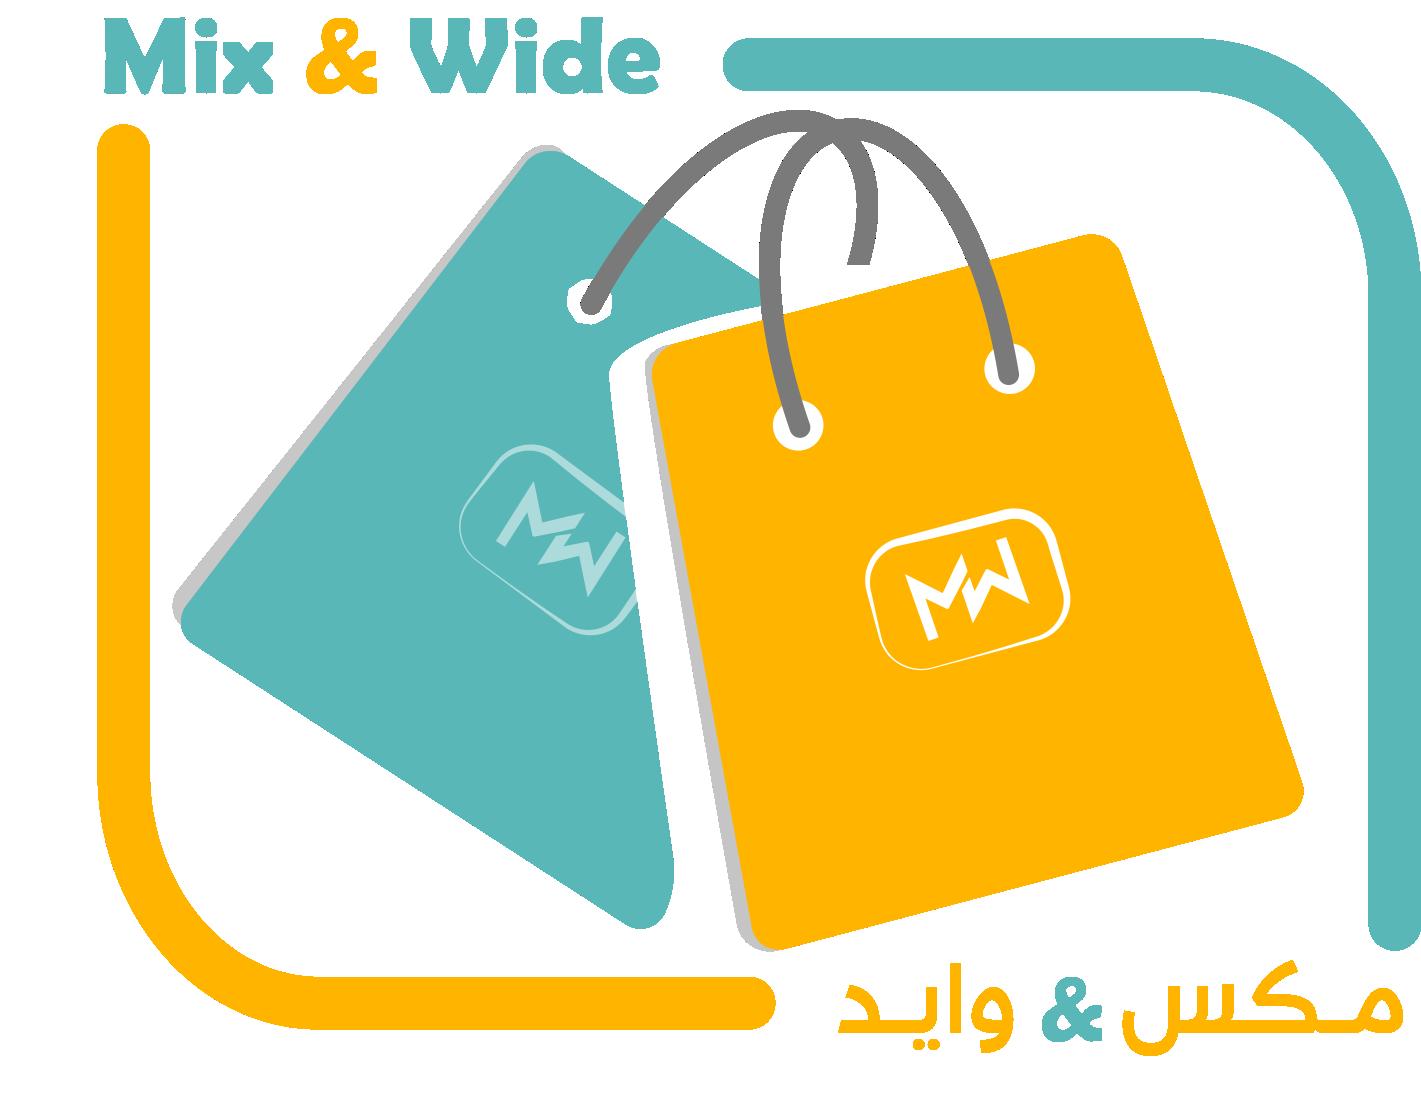 mixwidlogo - mix wid